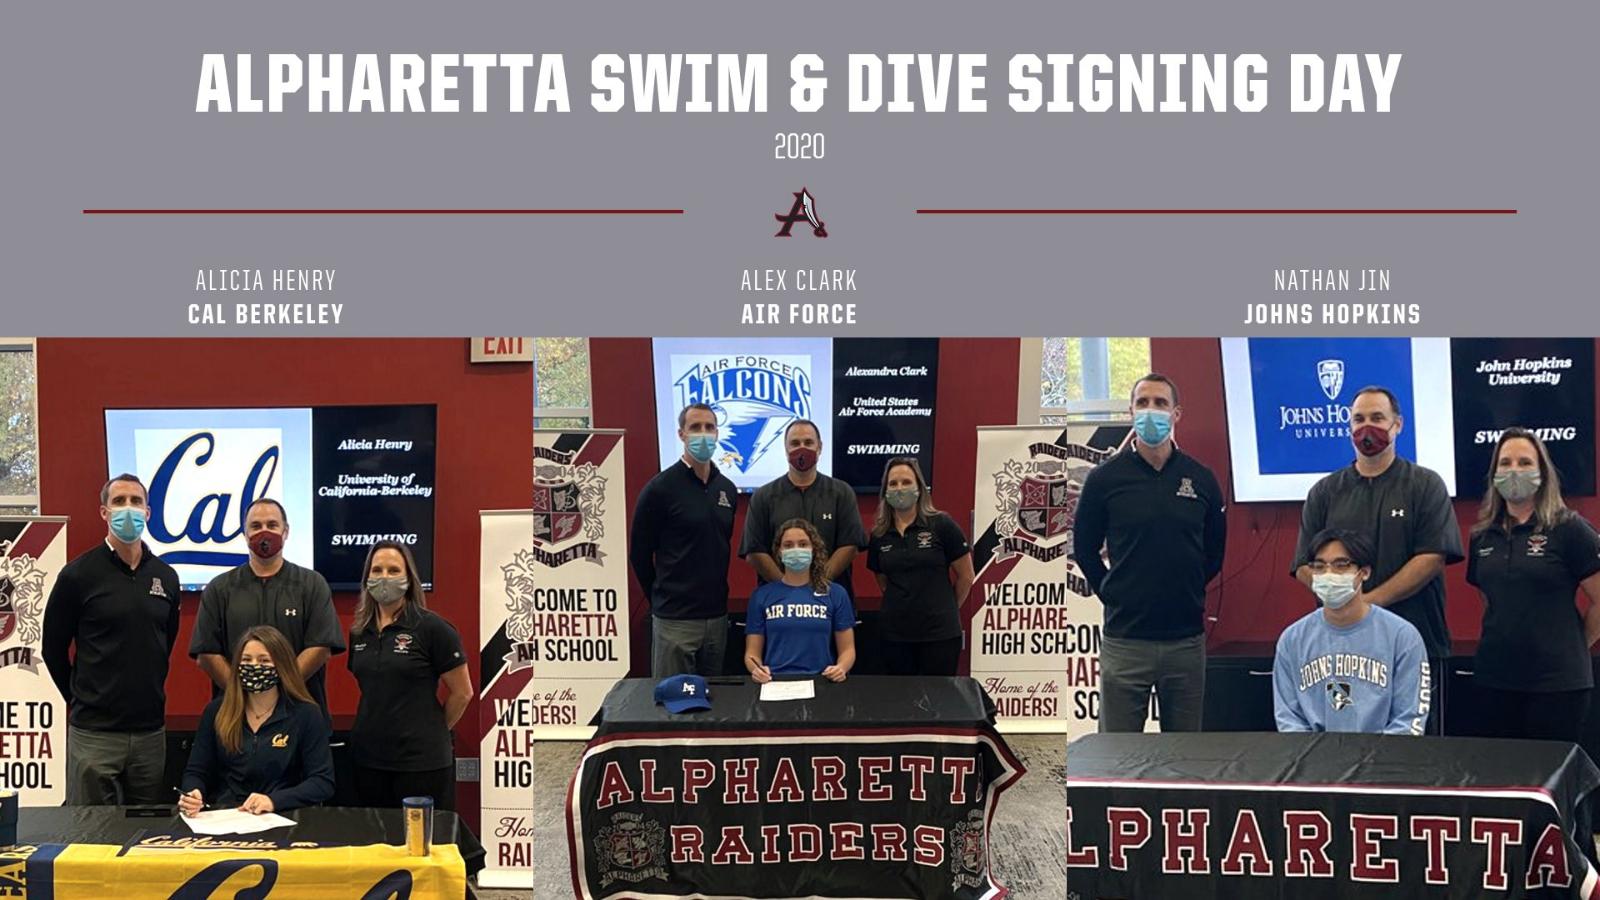 Alpharetta Swim & Dive Signing Day